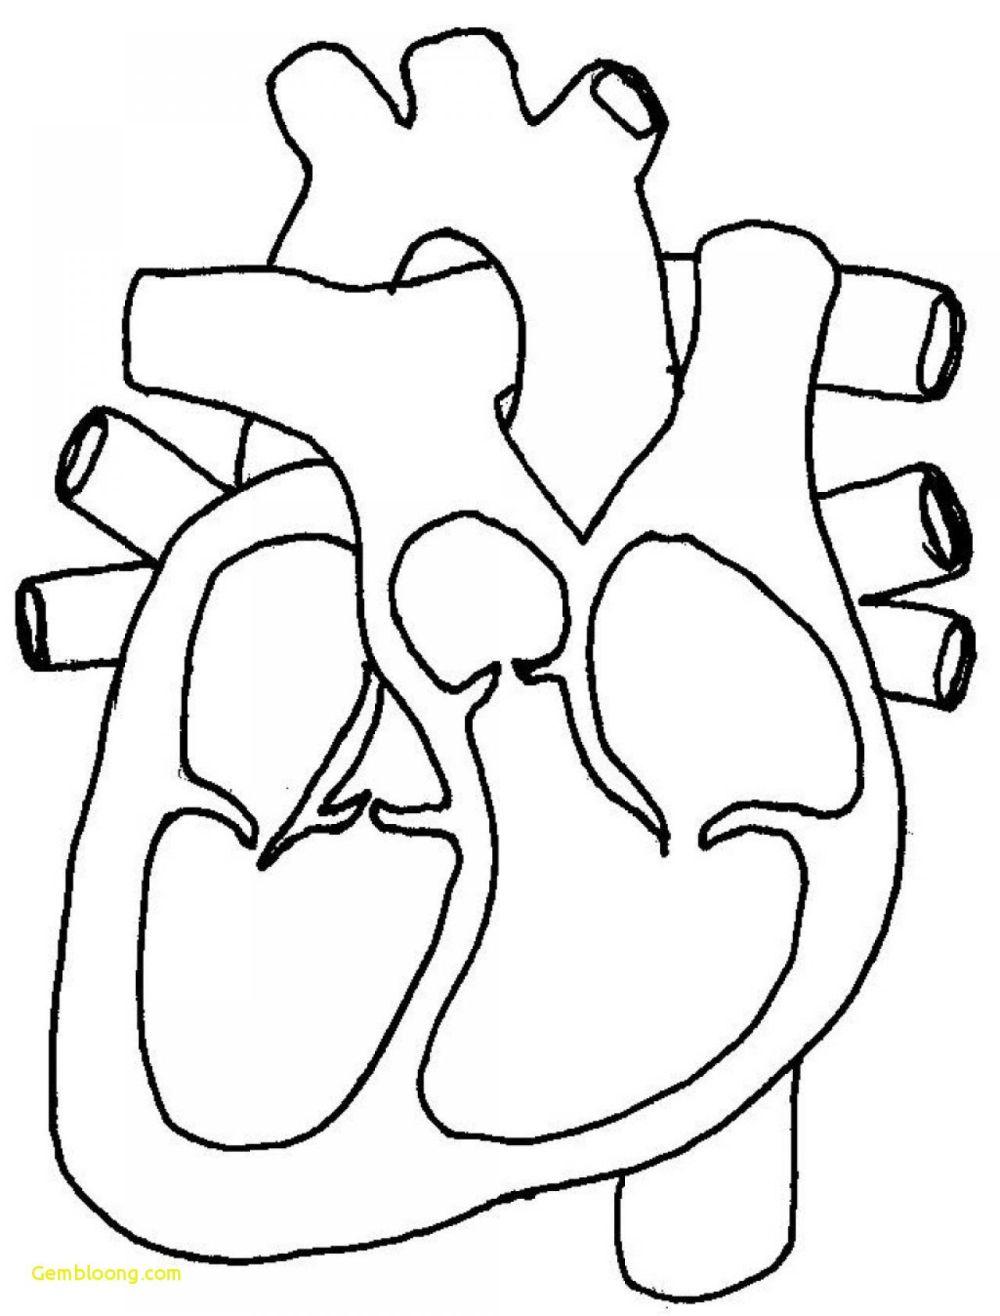 medium resolution of 1280x1685 blank human body diagram human anatomy drawing human body blank drawing of human body